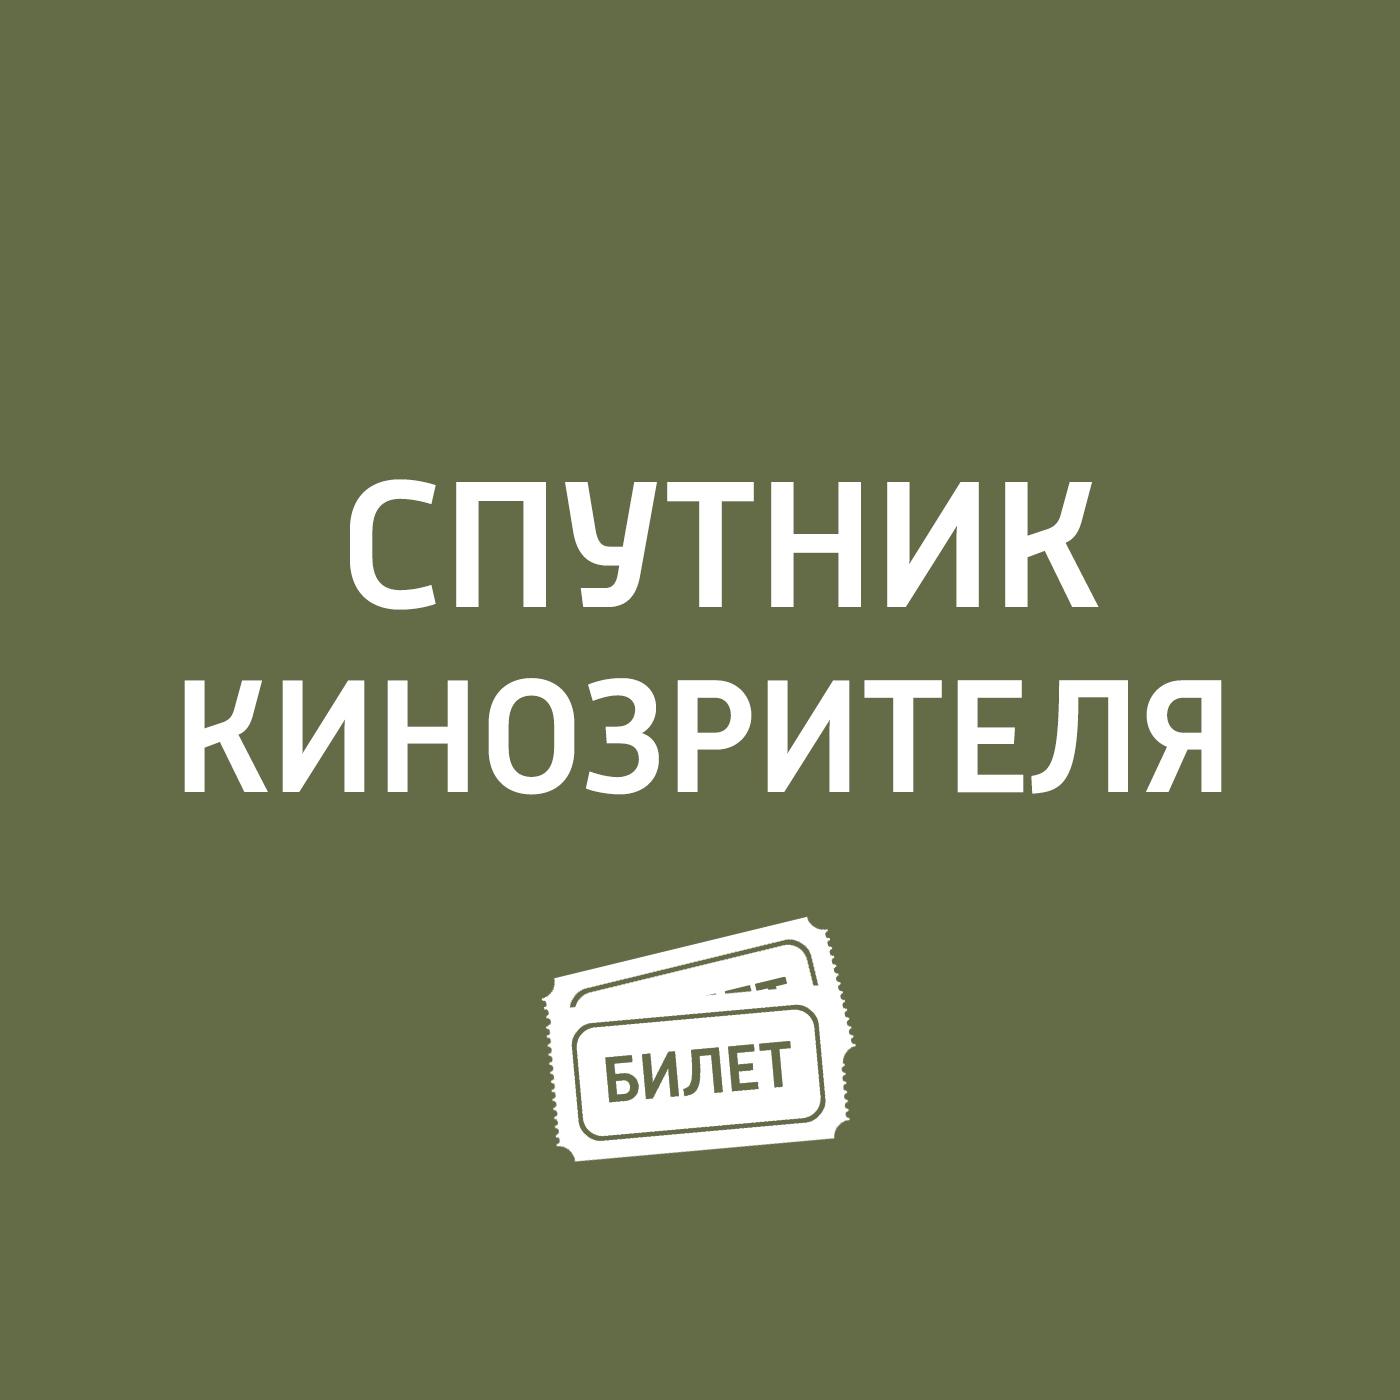 Антон Долин 007: Координаты «Скайфолл, «Любовь, «Пианистка видеошлем eachine vr 007 pro